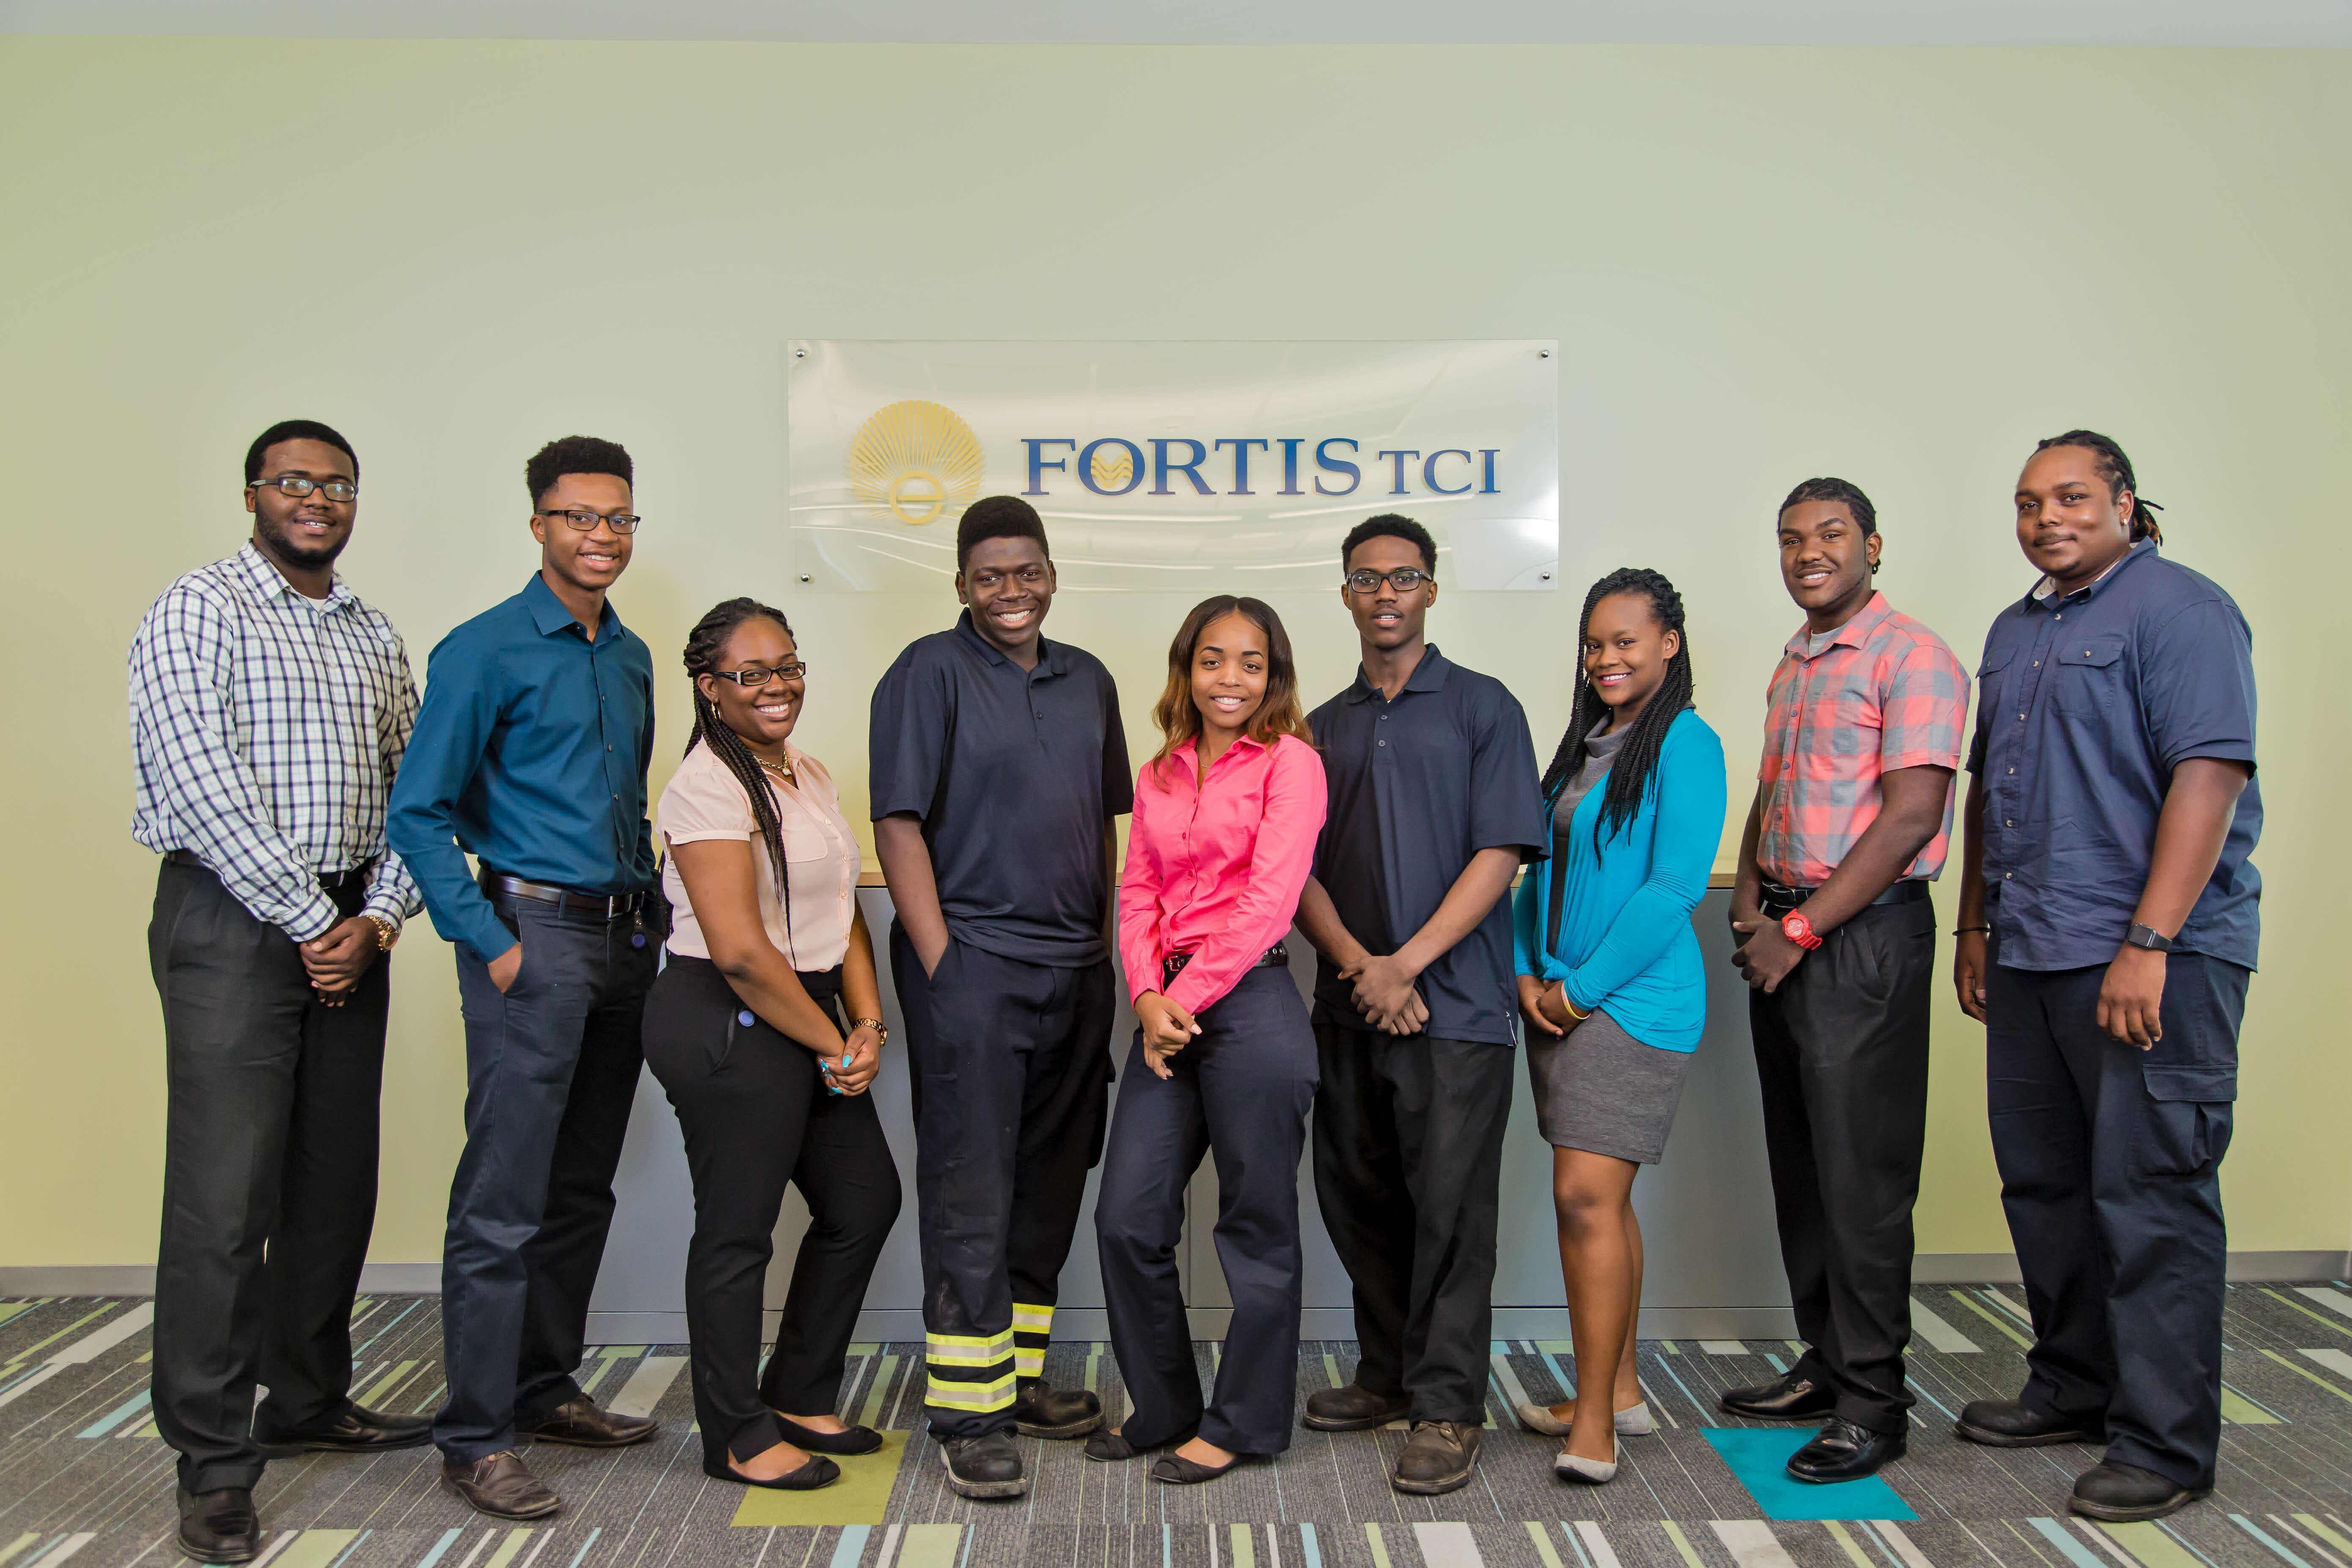 The TCI Future Workforce Explores FortisTCI through Summer Internship Programs